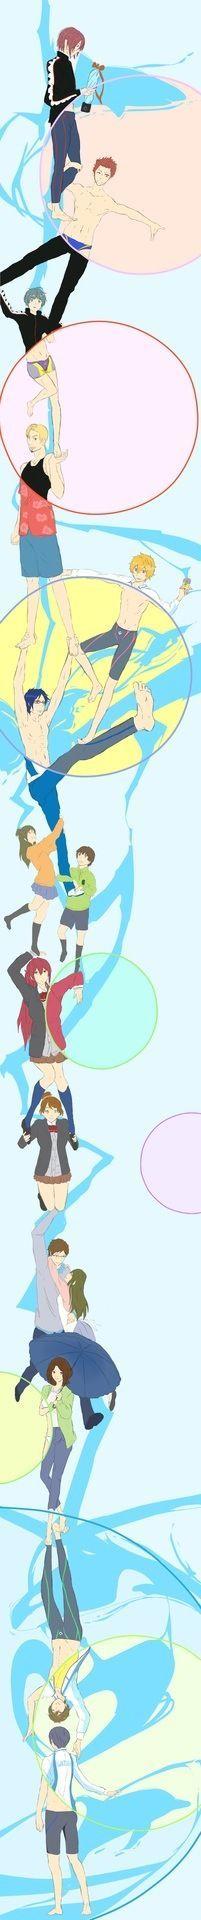 Free! Iwatobi Swim Club and Durarara! crossover! two of my favorite anime